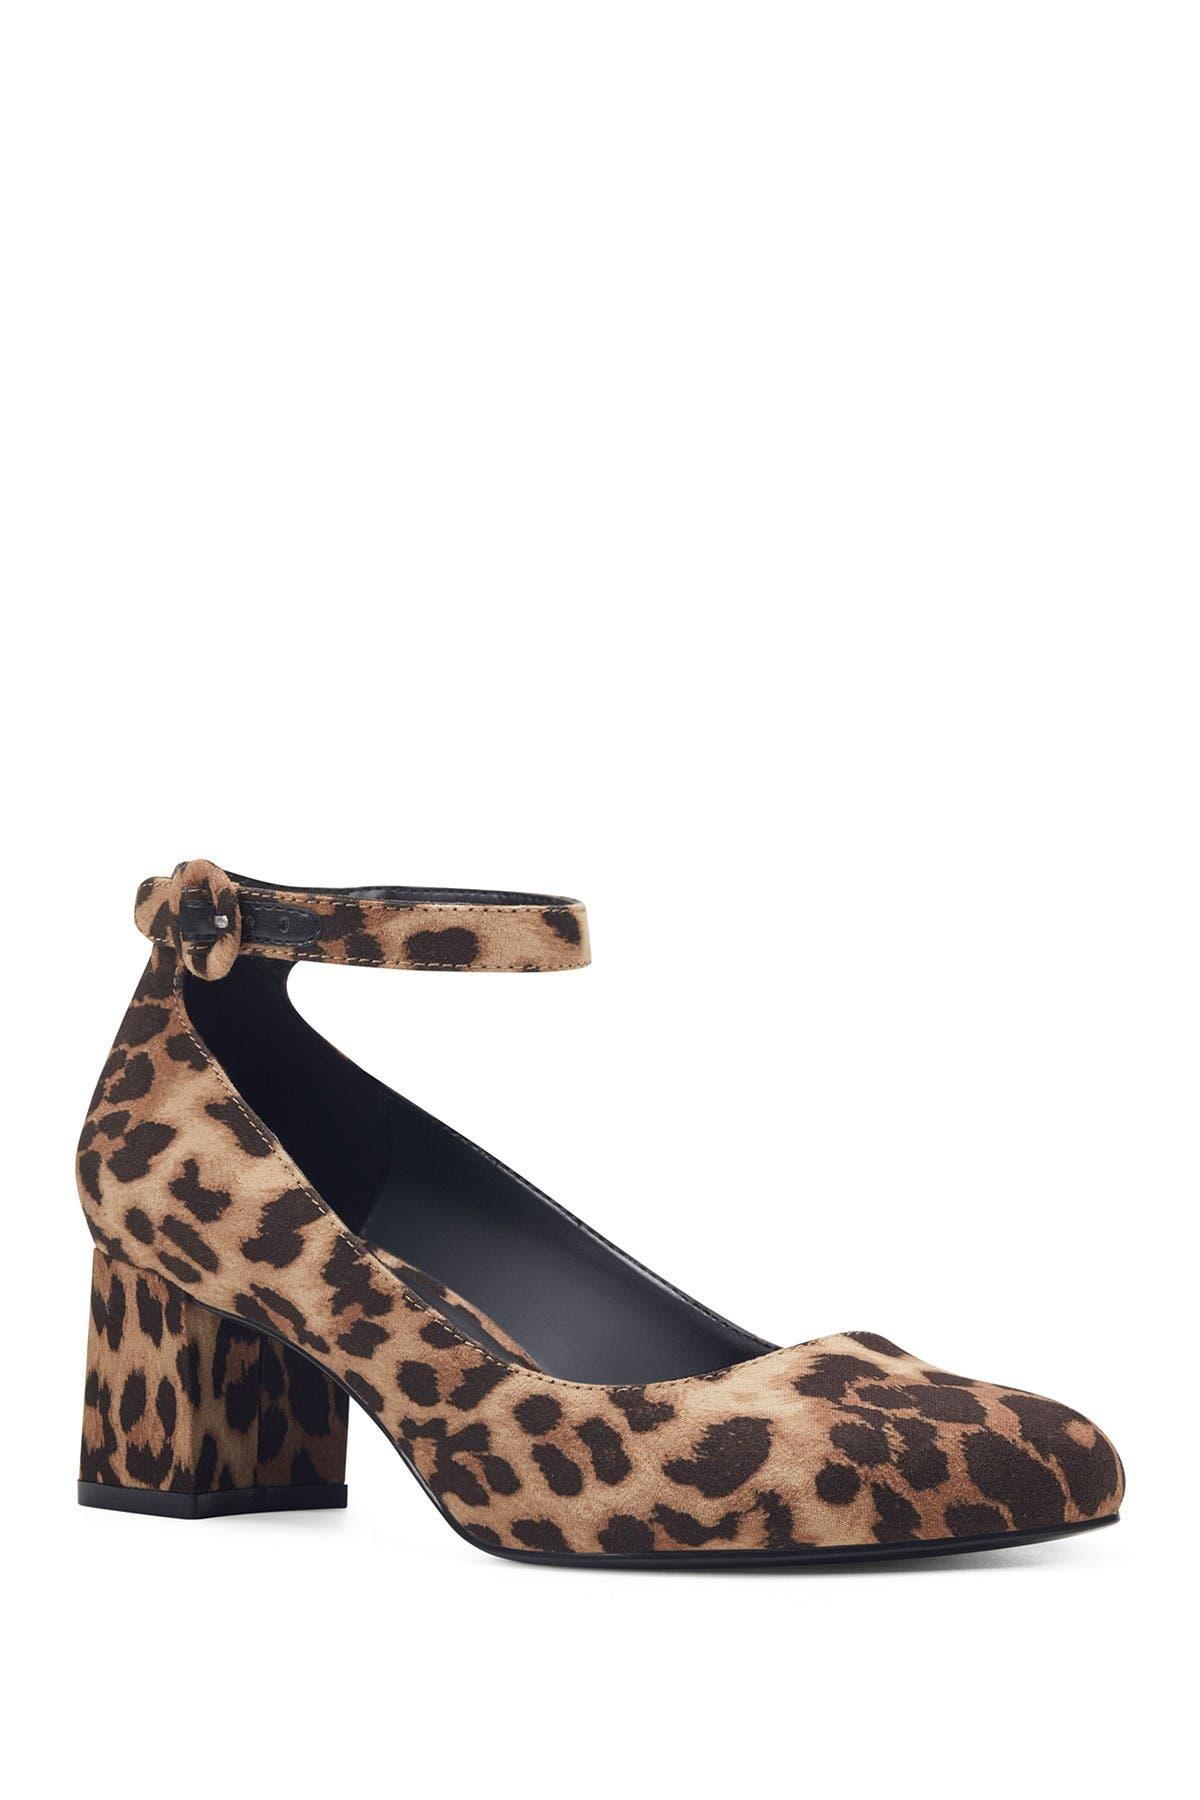 Odear Leopard Print Ankle Strap Pump